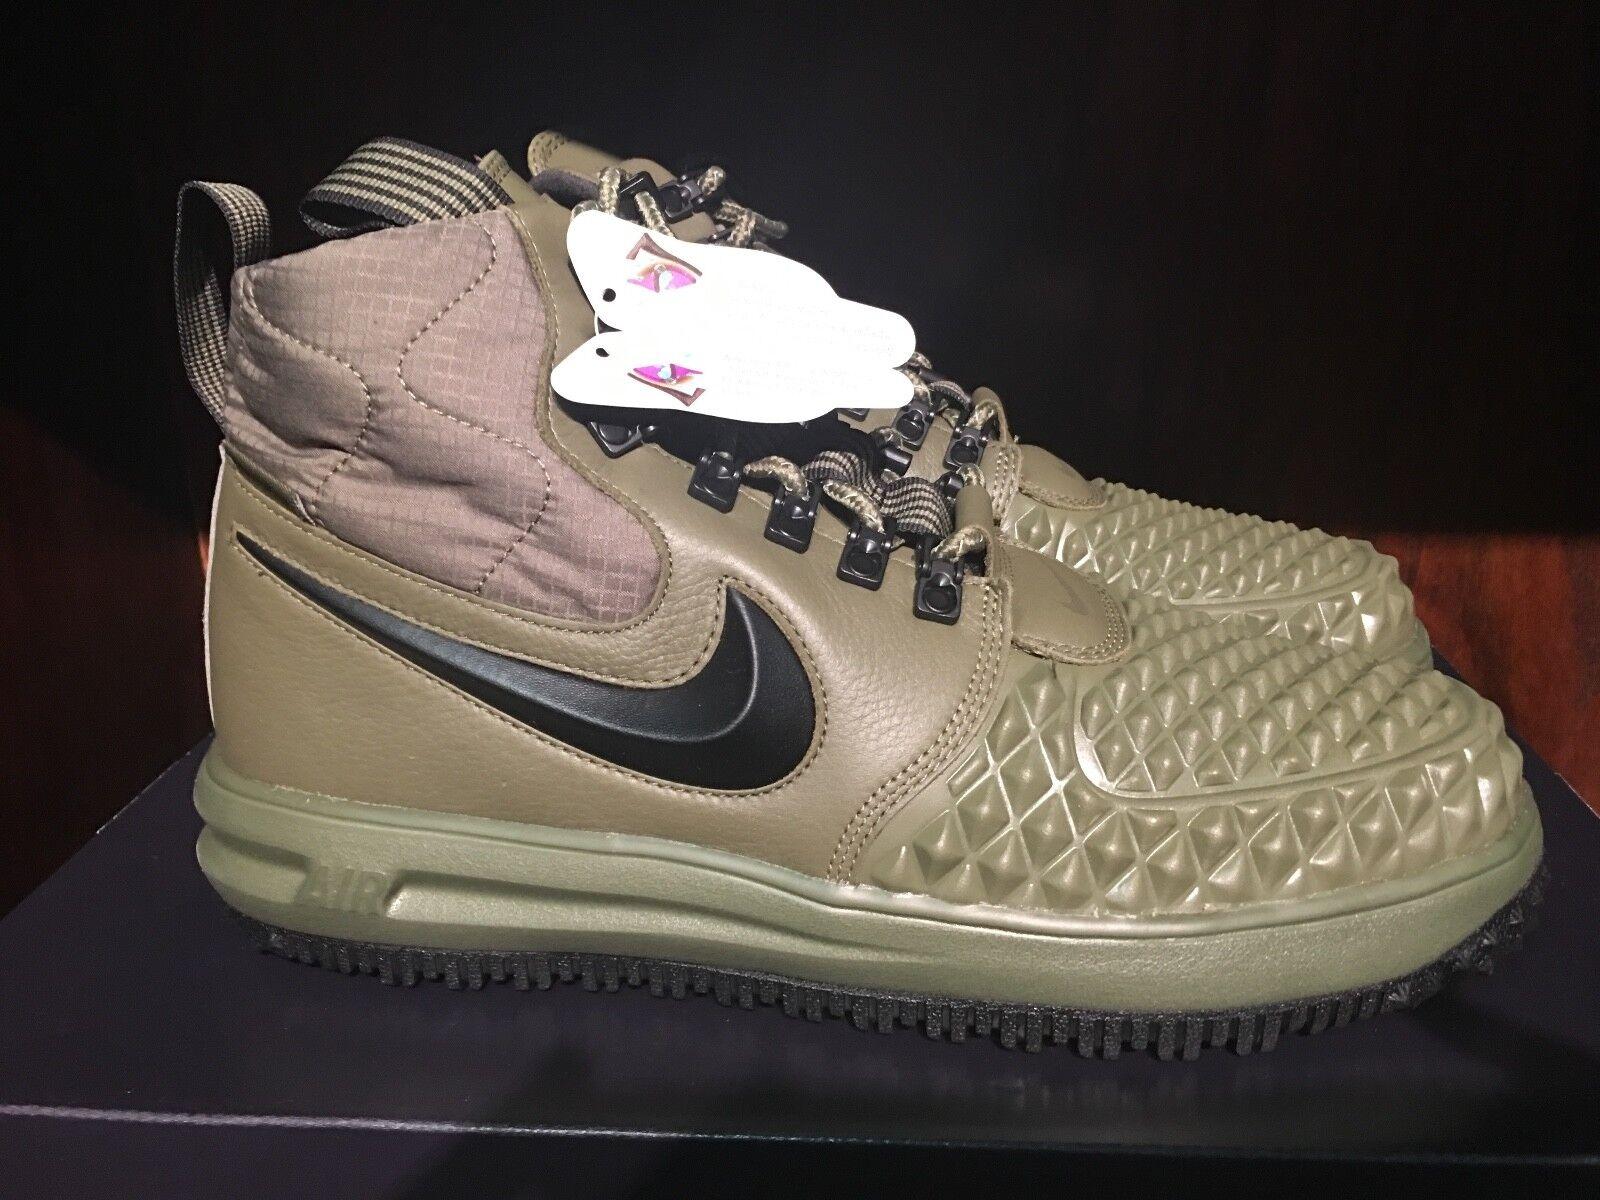 Nike lunar vigore 1 duck boot